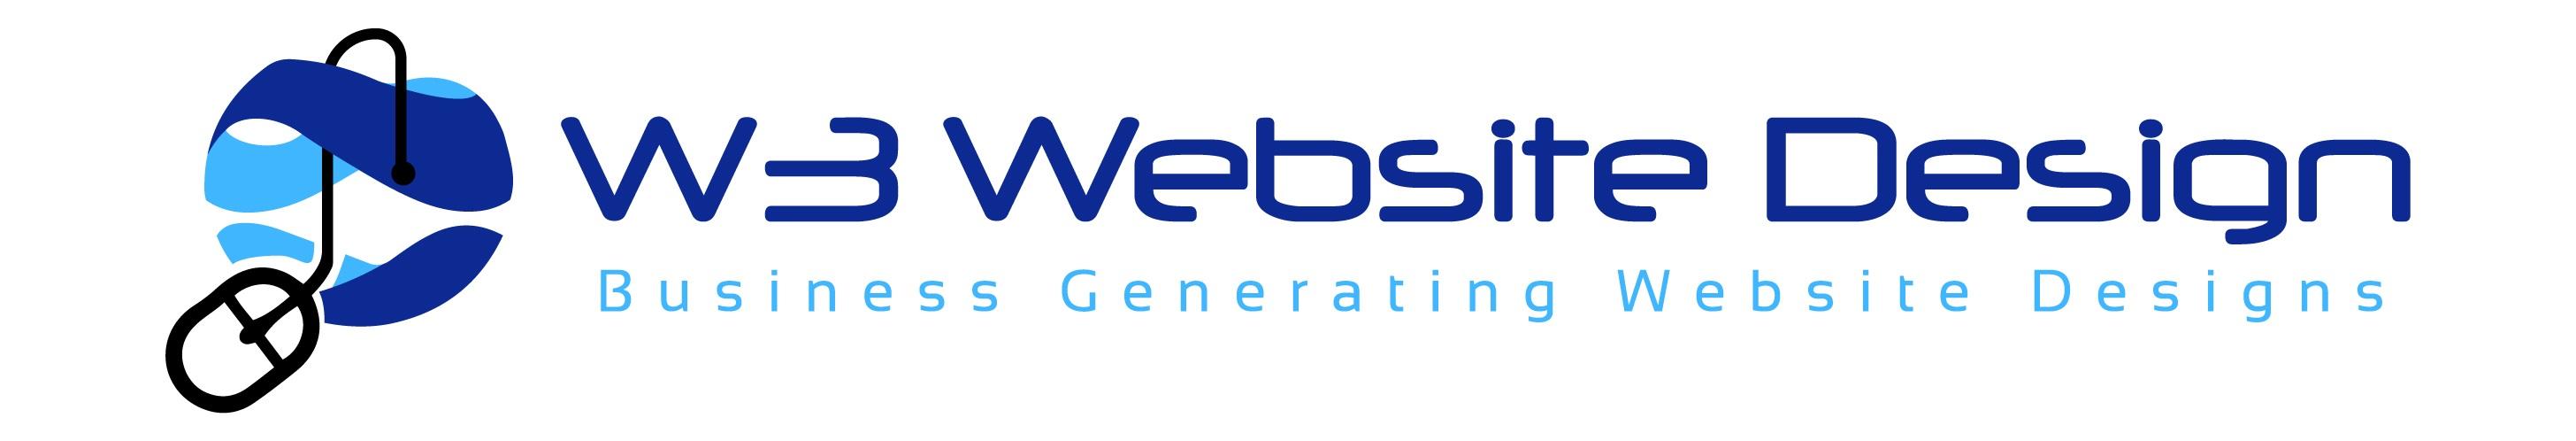 W3 Website Design & SEO Services Samford, Brisbane.